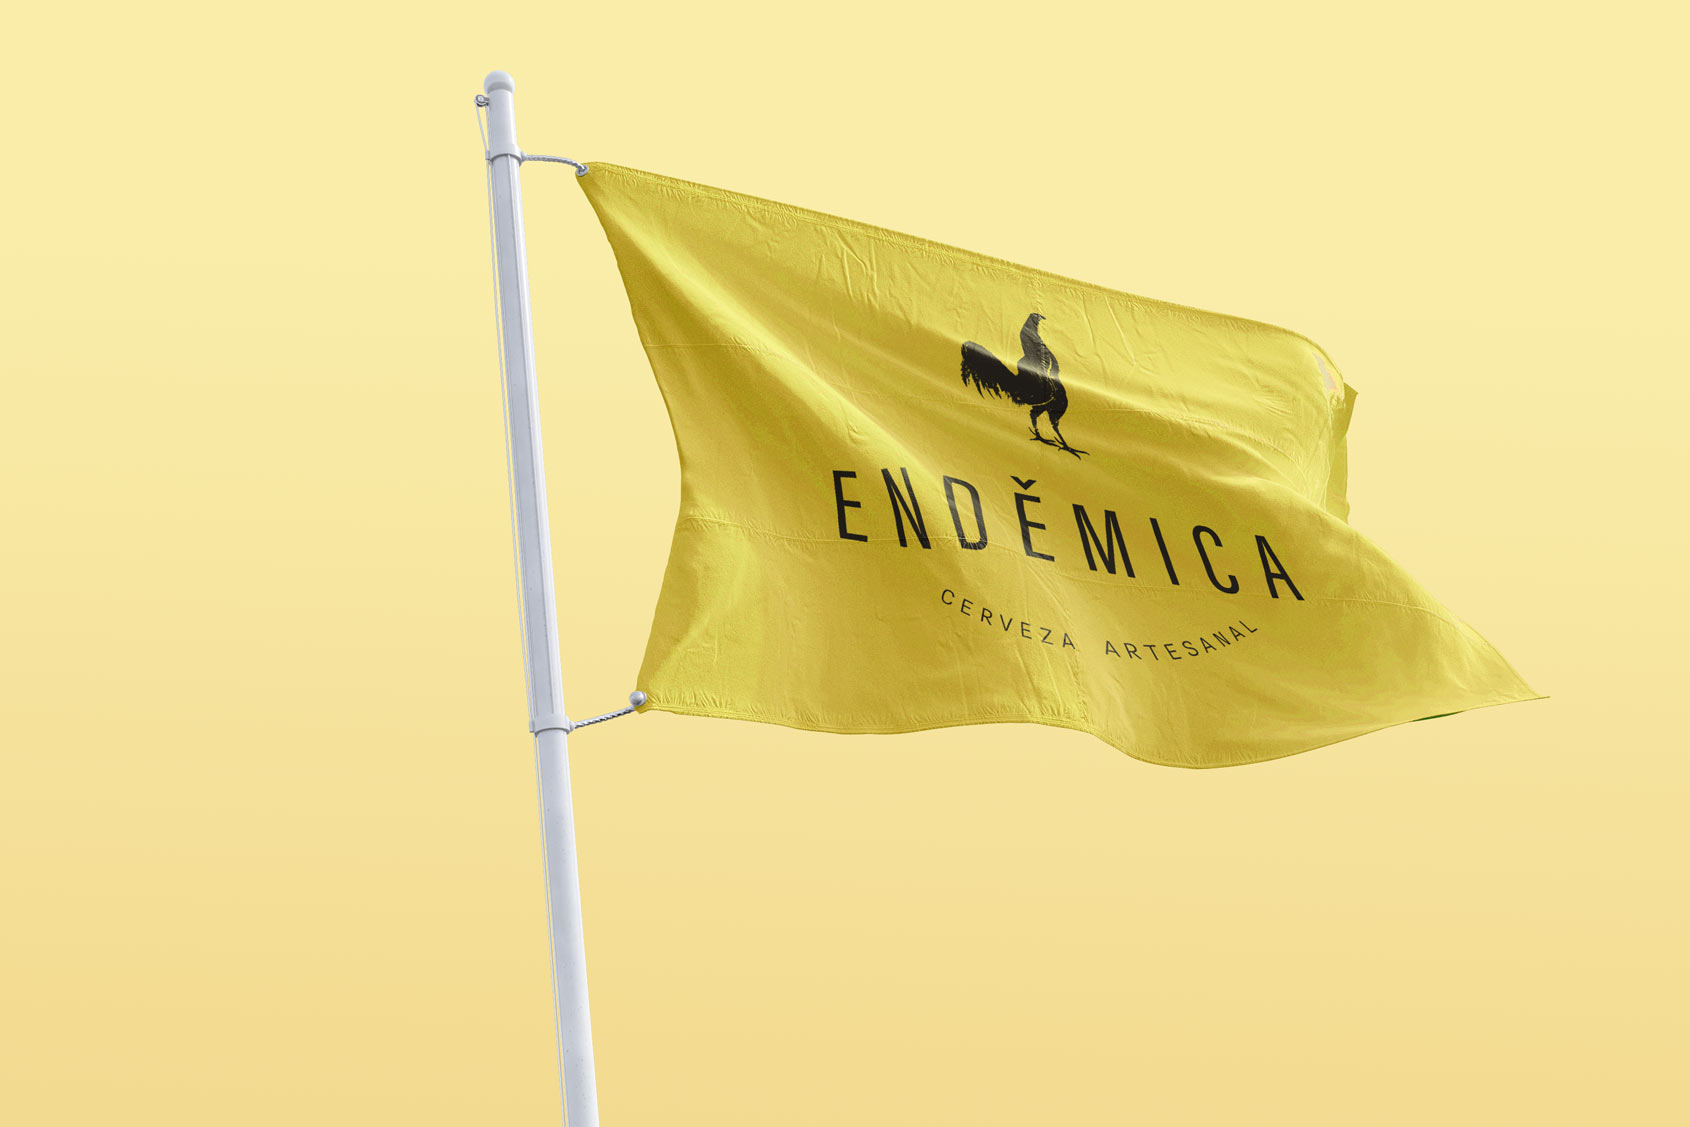 ENDEMICA-Banderas